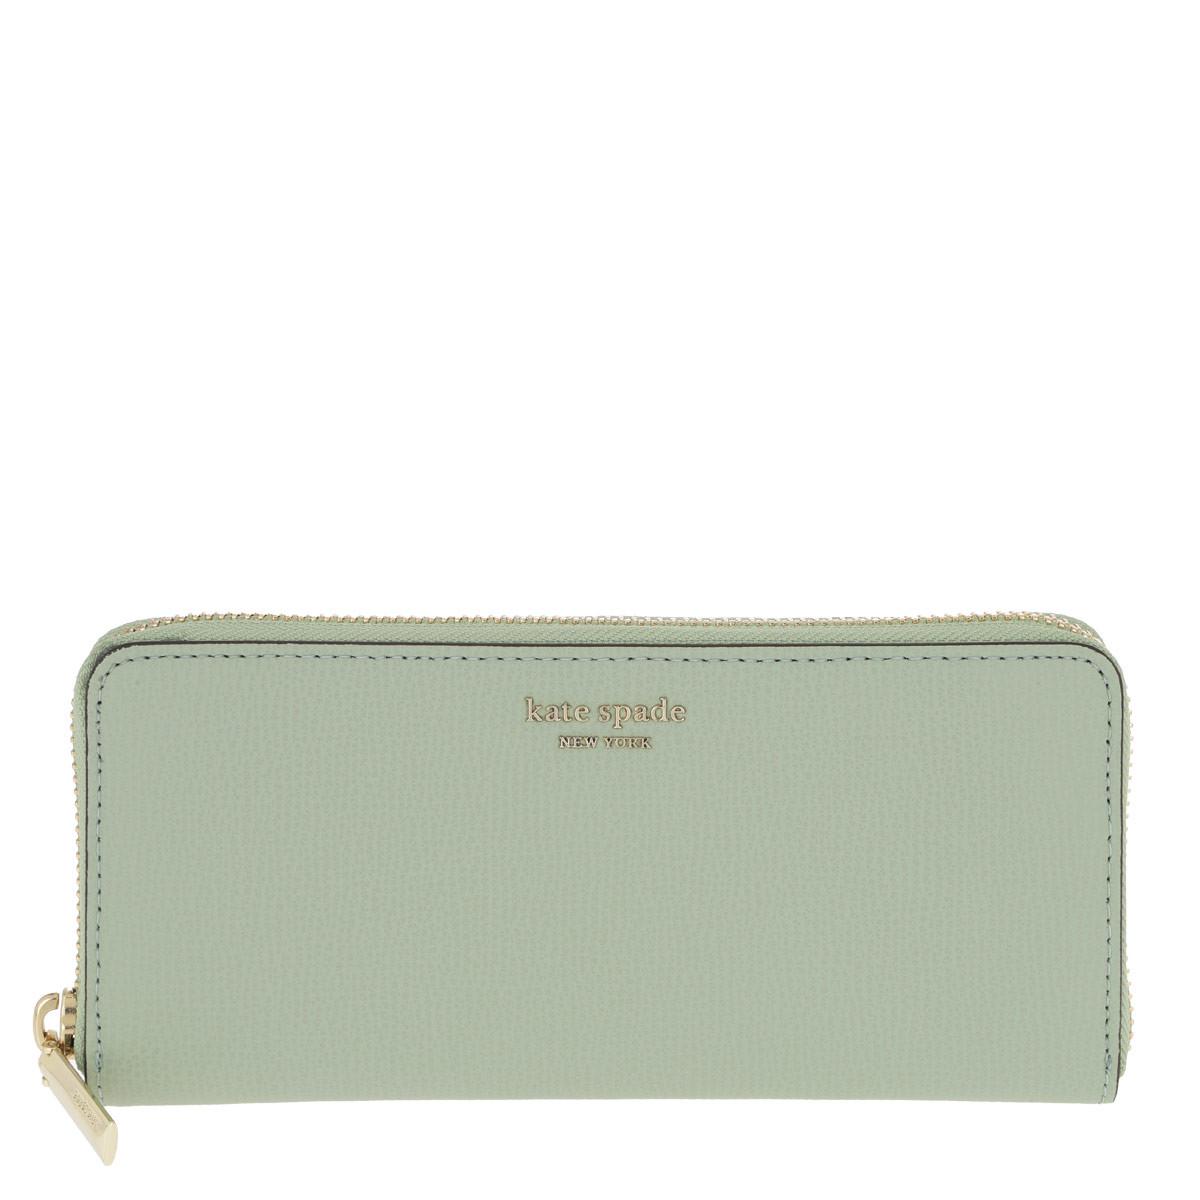 Kate Spade New York Portemonnaie - Sylvia Small Wallet Light Pistachio - in grün - für Damen